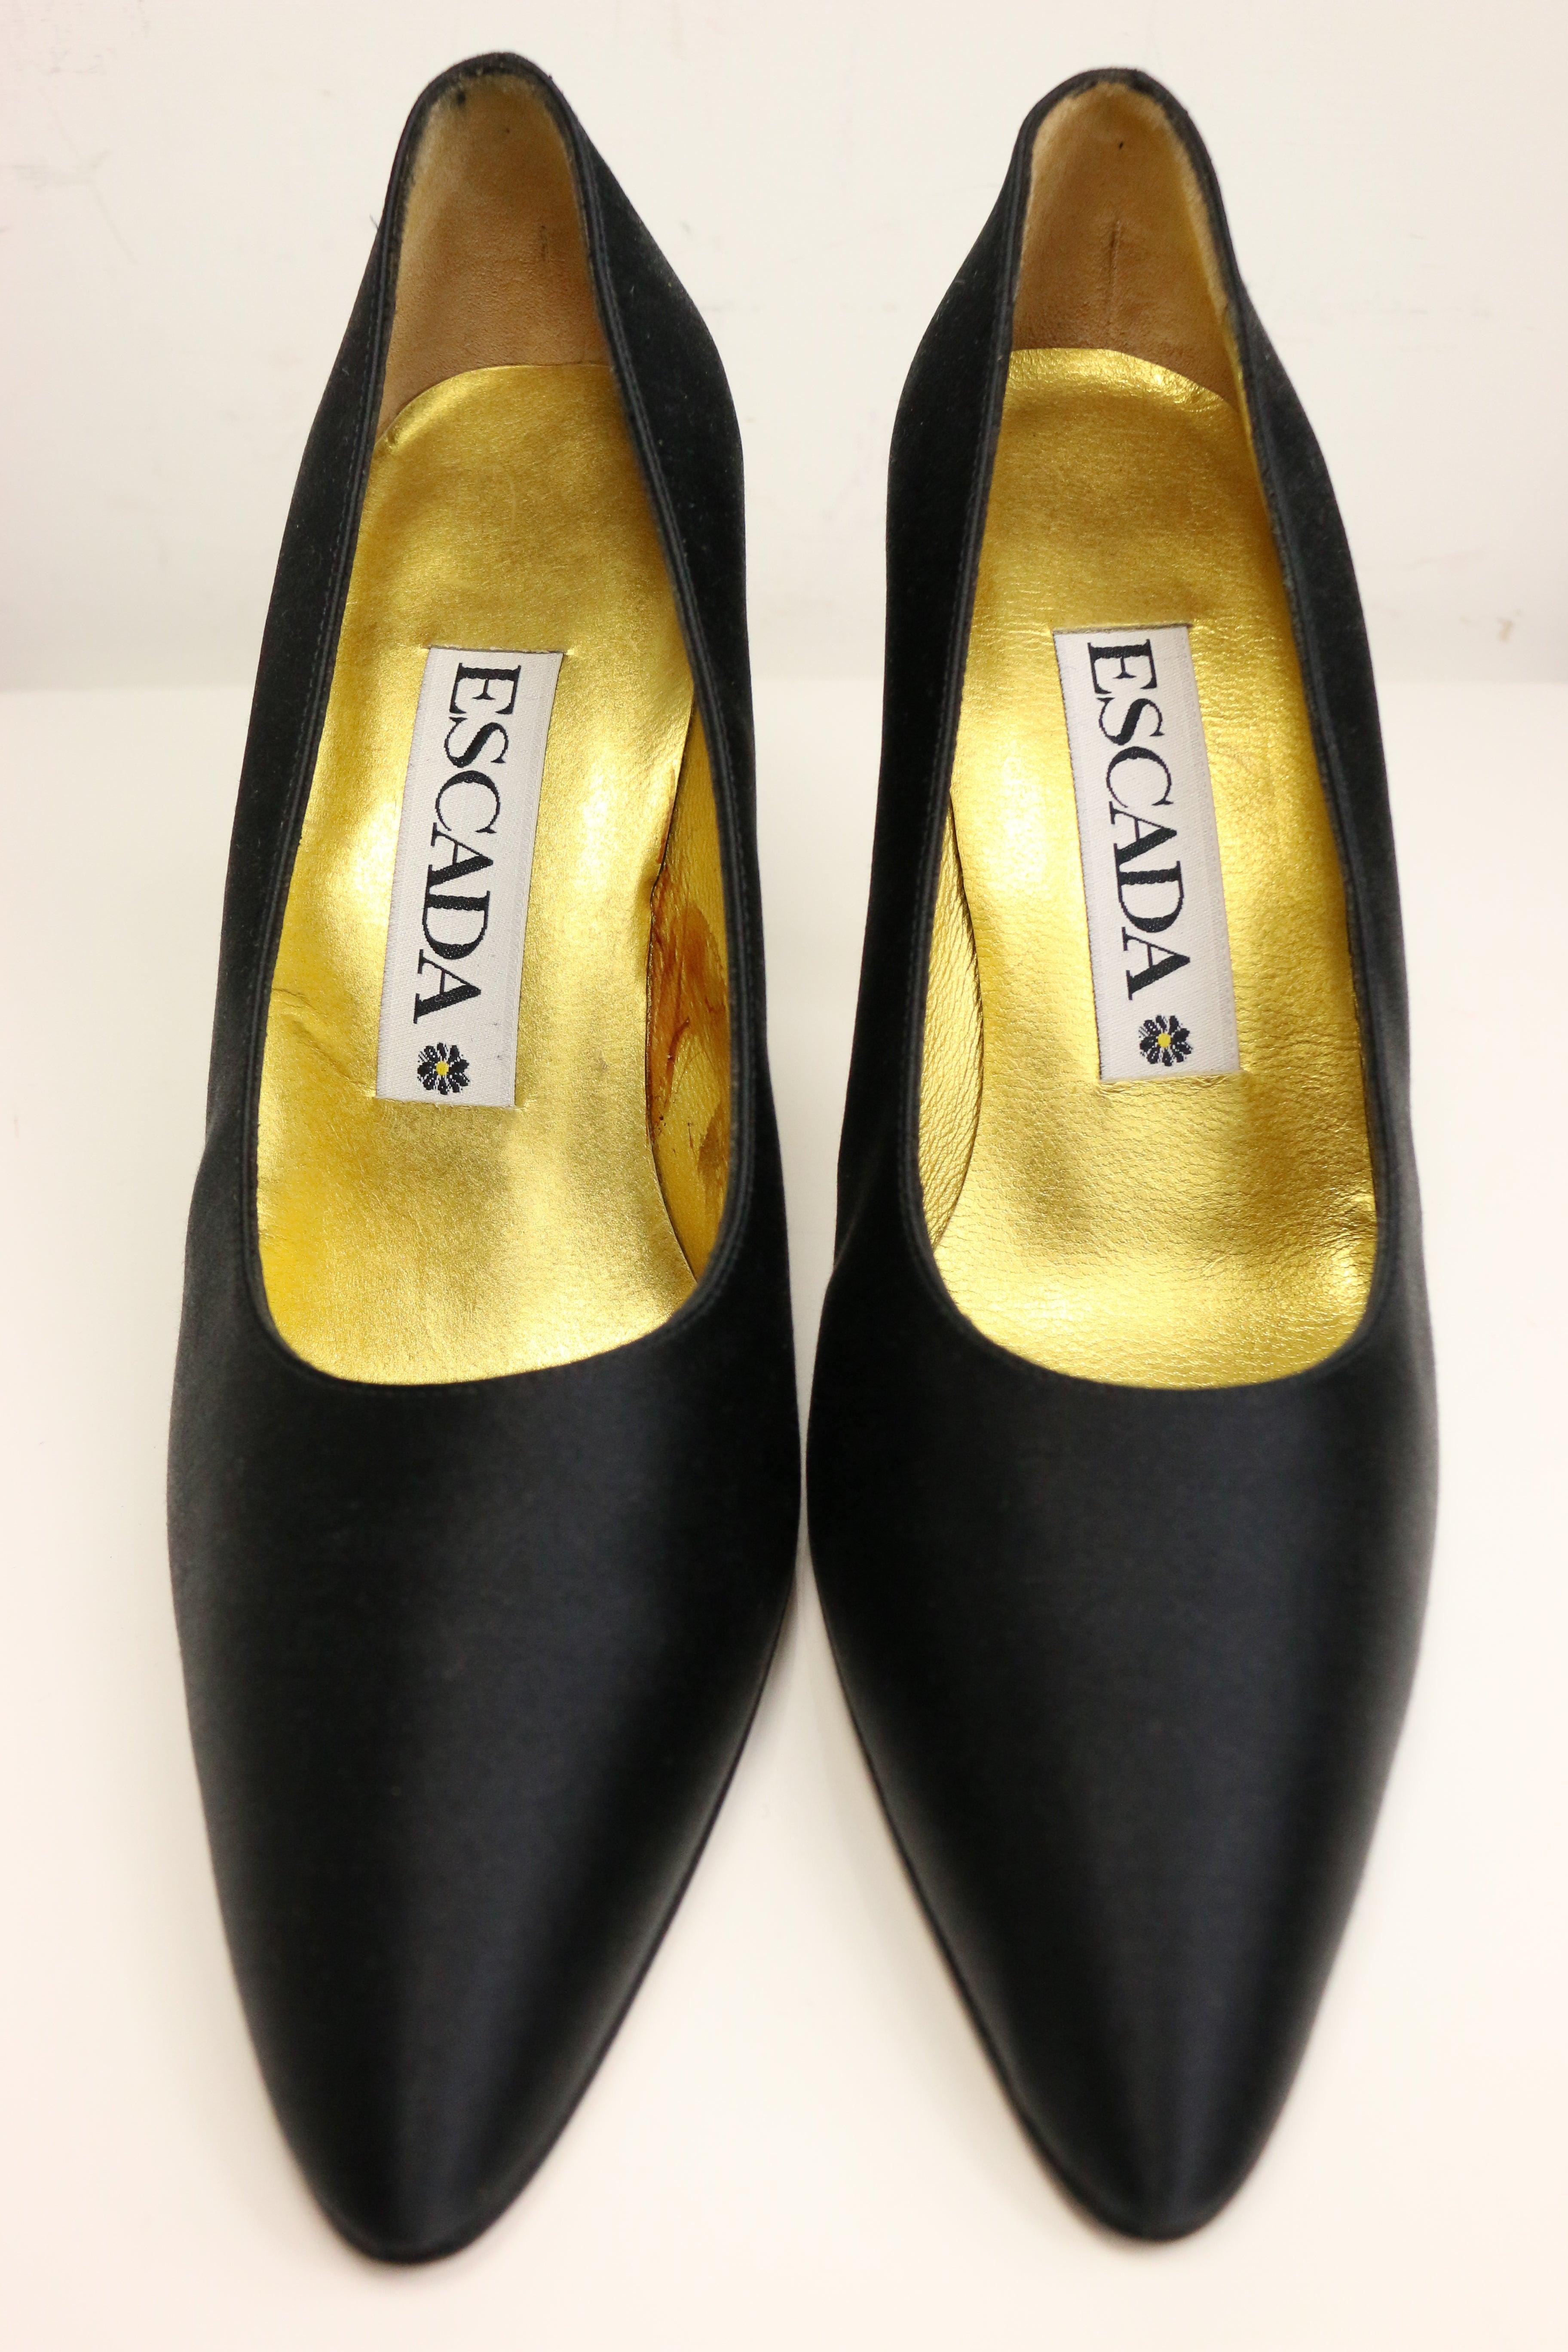 eb8c9b53cc7f Escada Black Satin Pointy Pumps with Crystal Rhinestones Gold Toned Heels  For Sale at 1stdibs